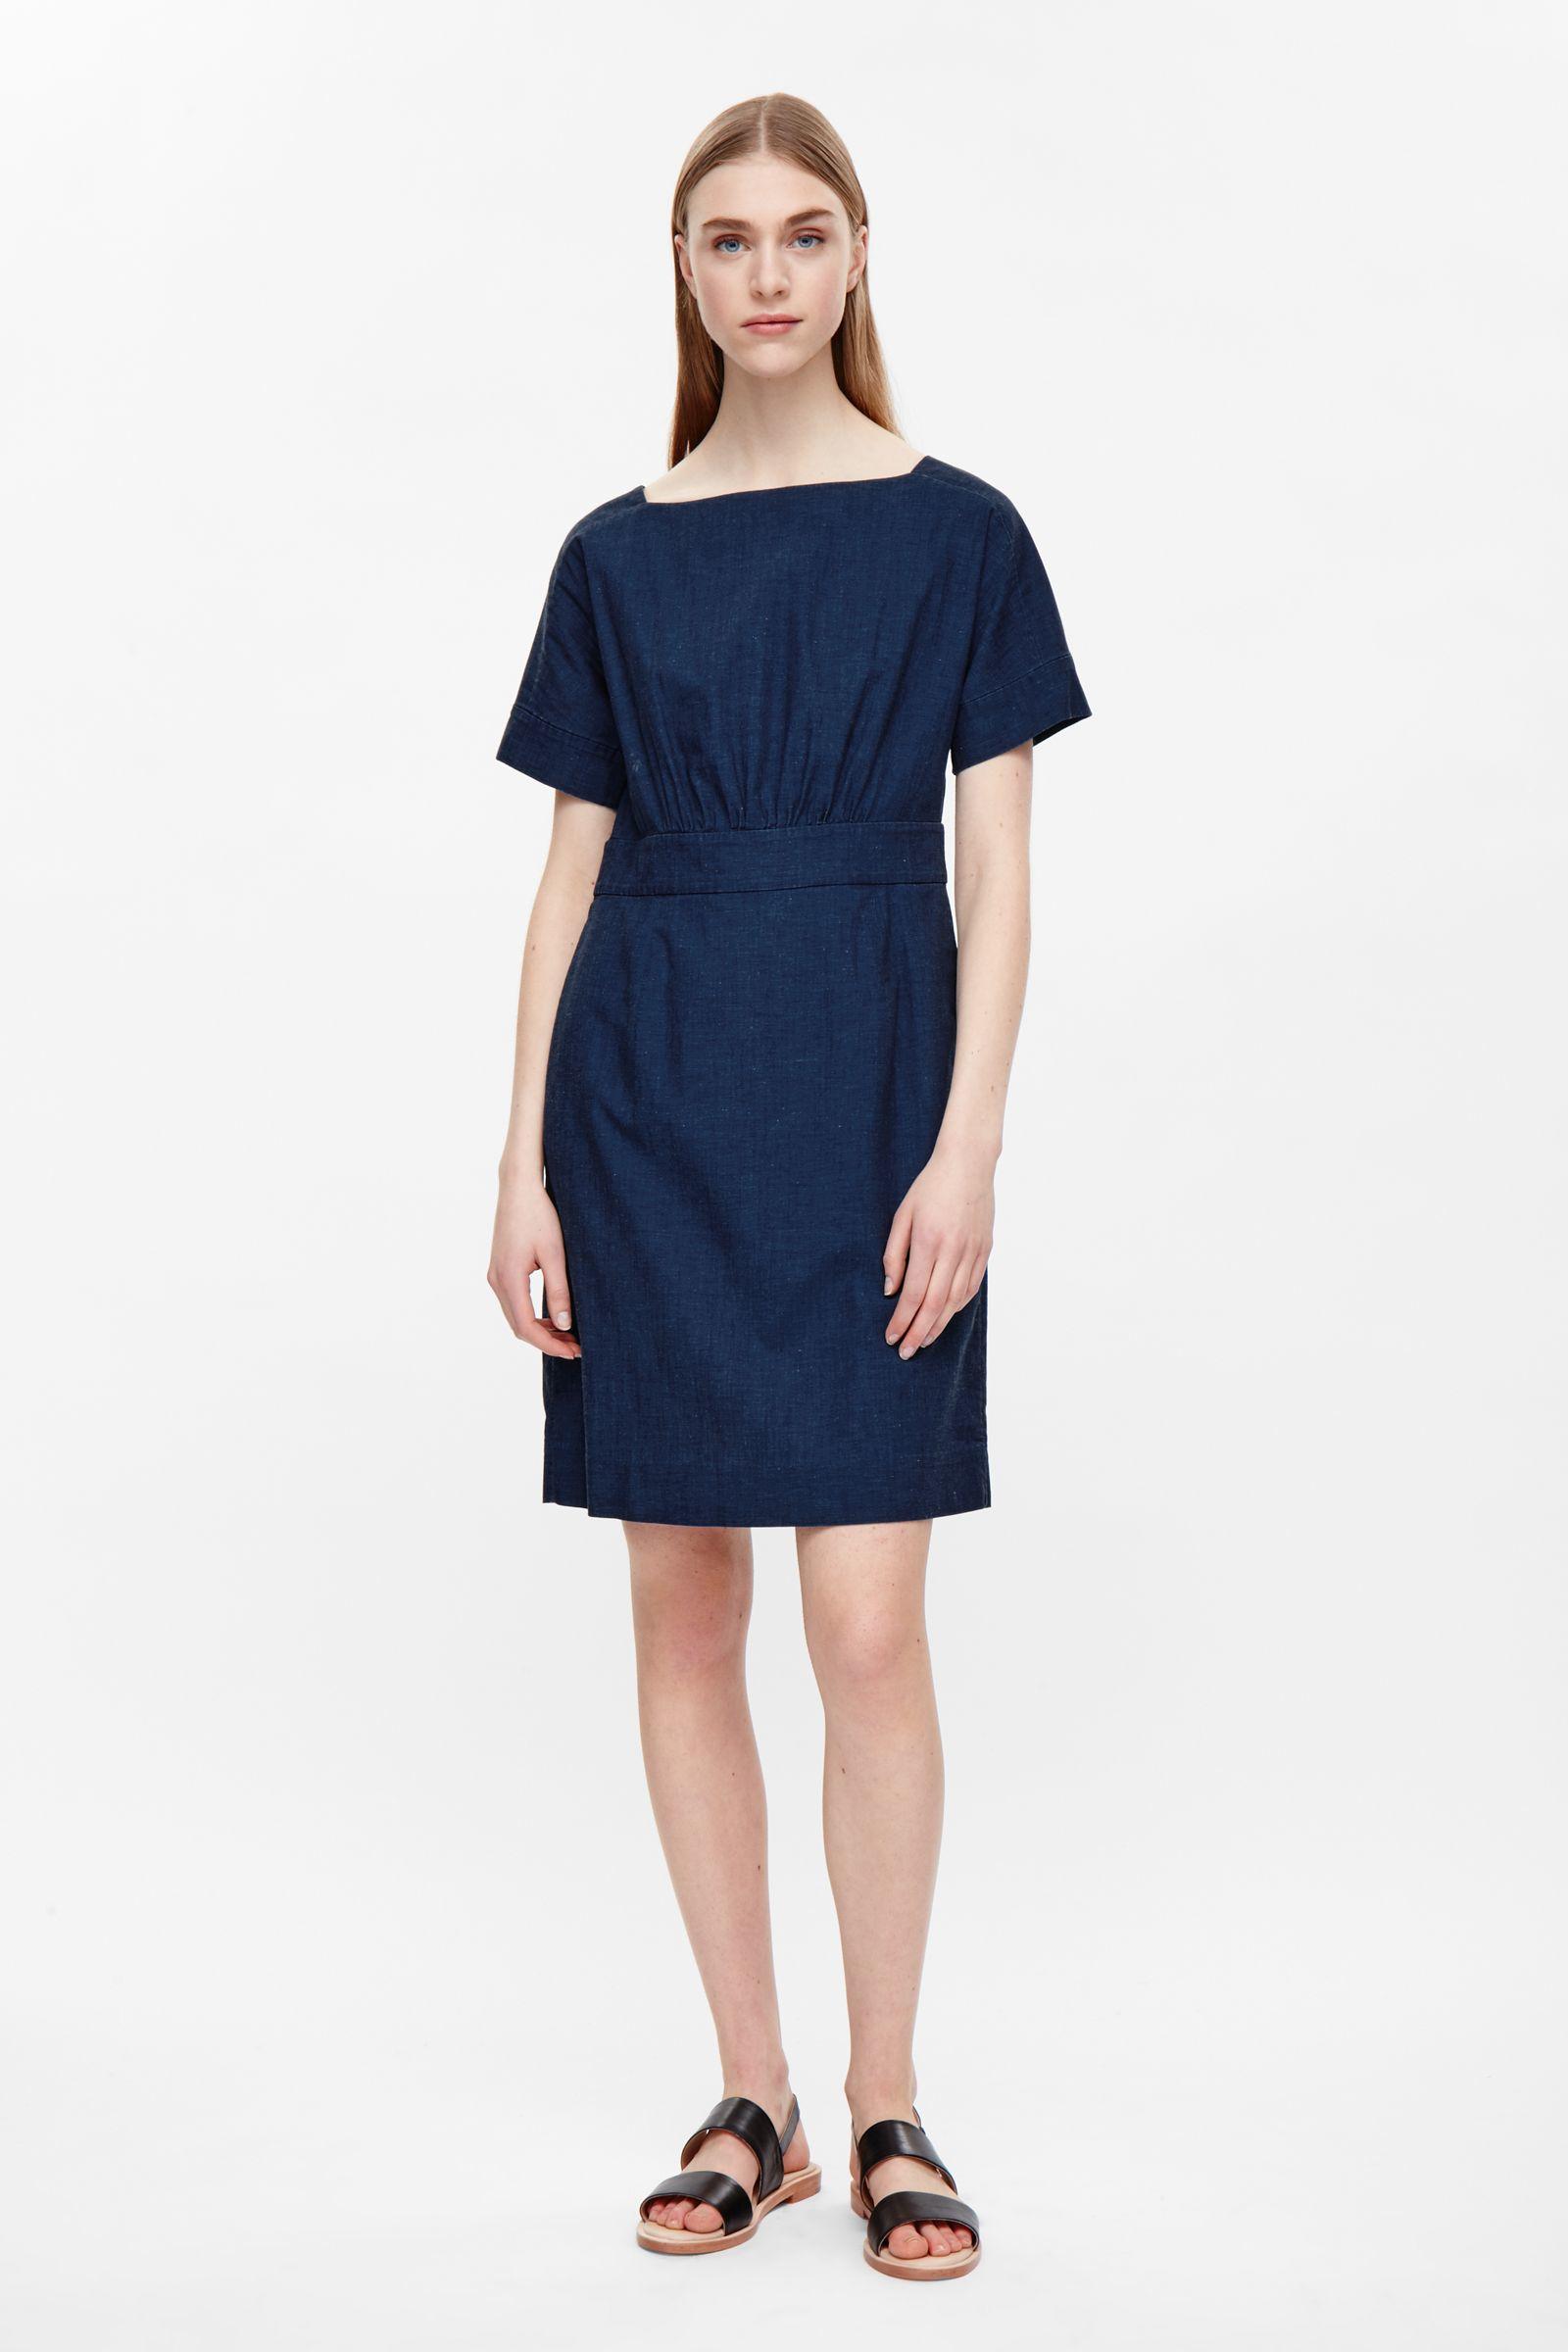 Cos Wide Neck Denim Dress In Blue Cobalt Lyst